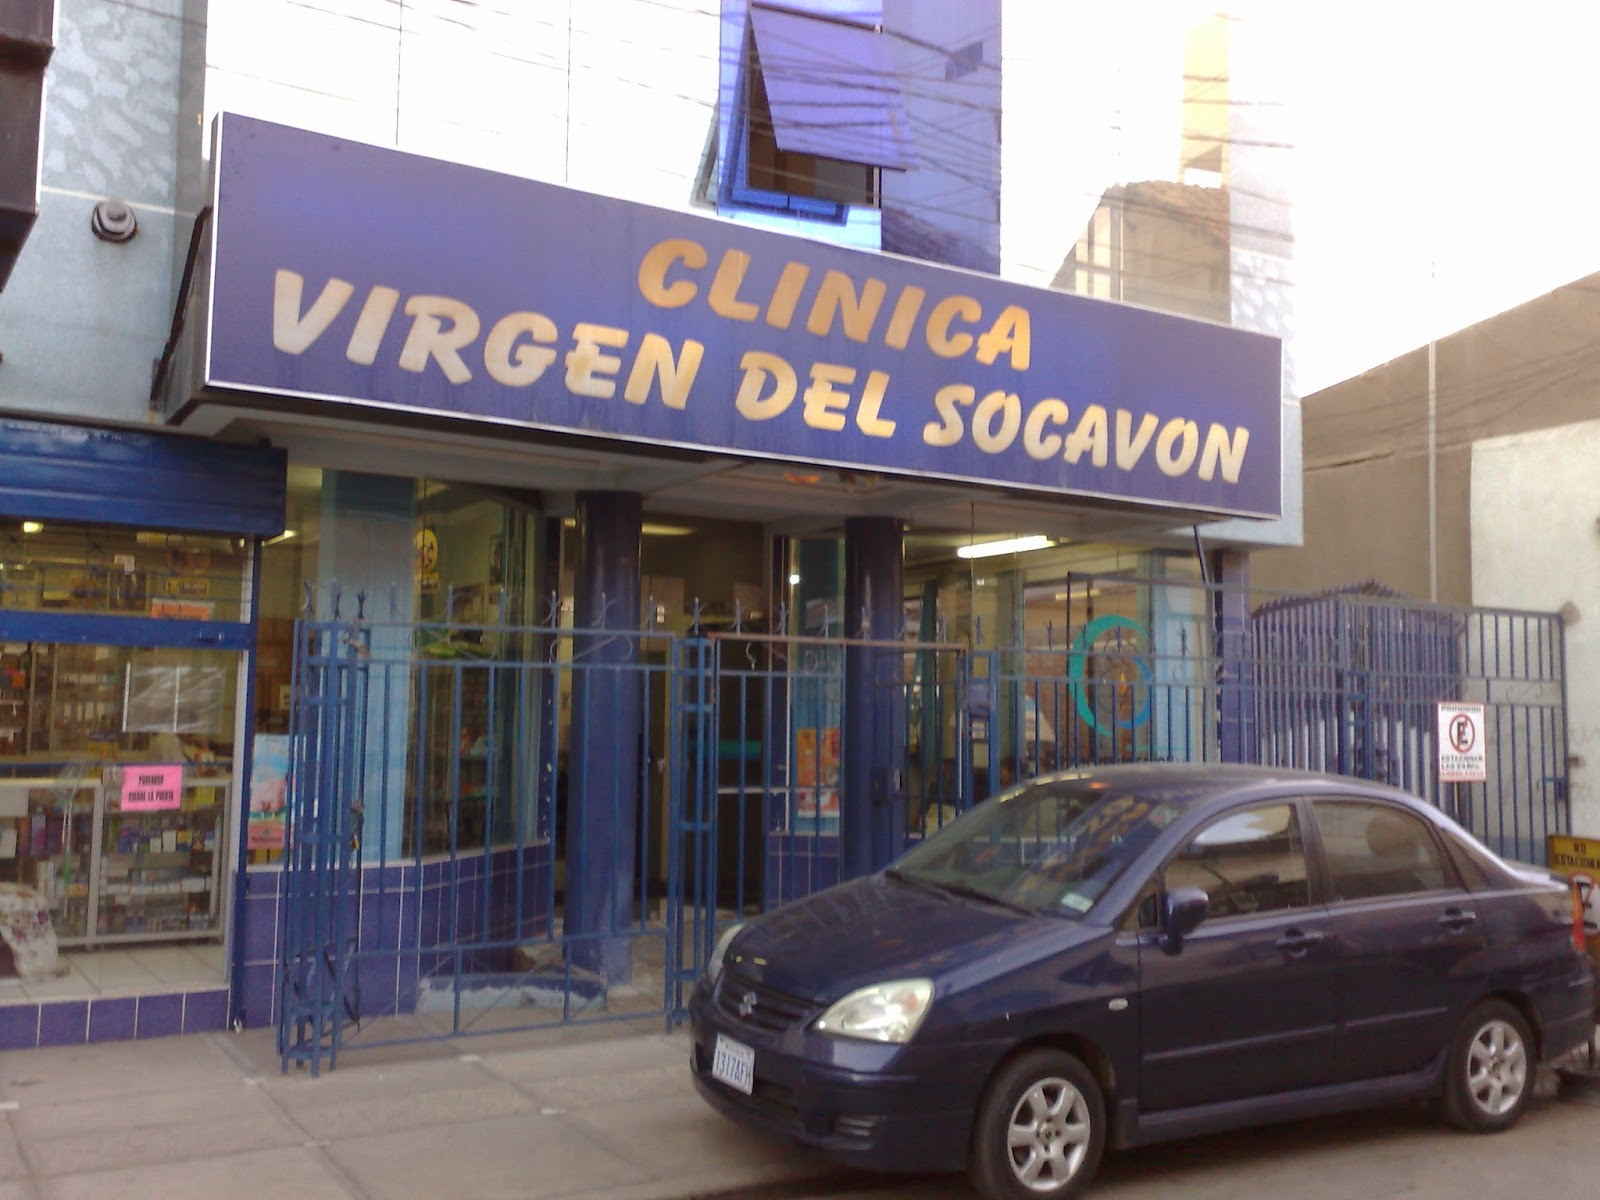 033 05092011779 - AVENTURA: SALAR DE UYUNI E LAGUNAS BOLIVIANAS VIA ACRE